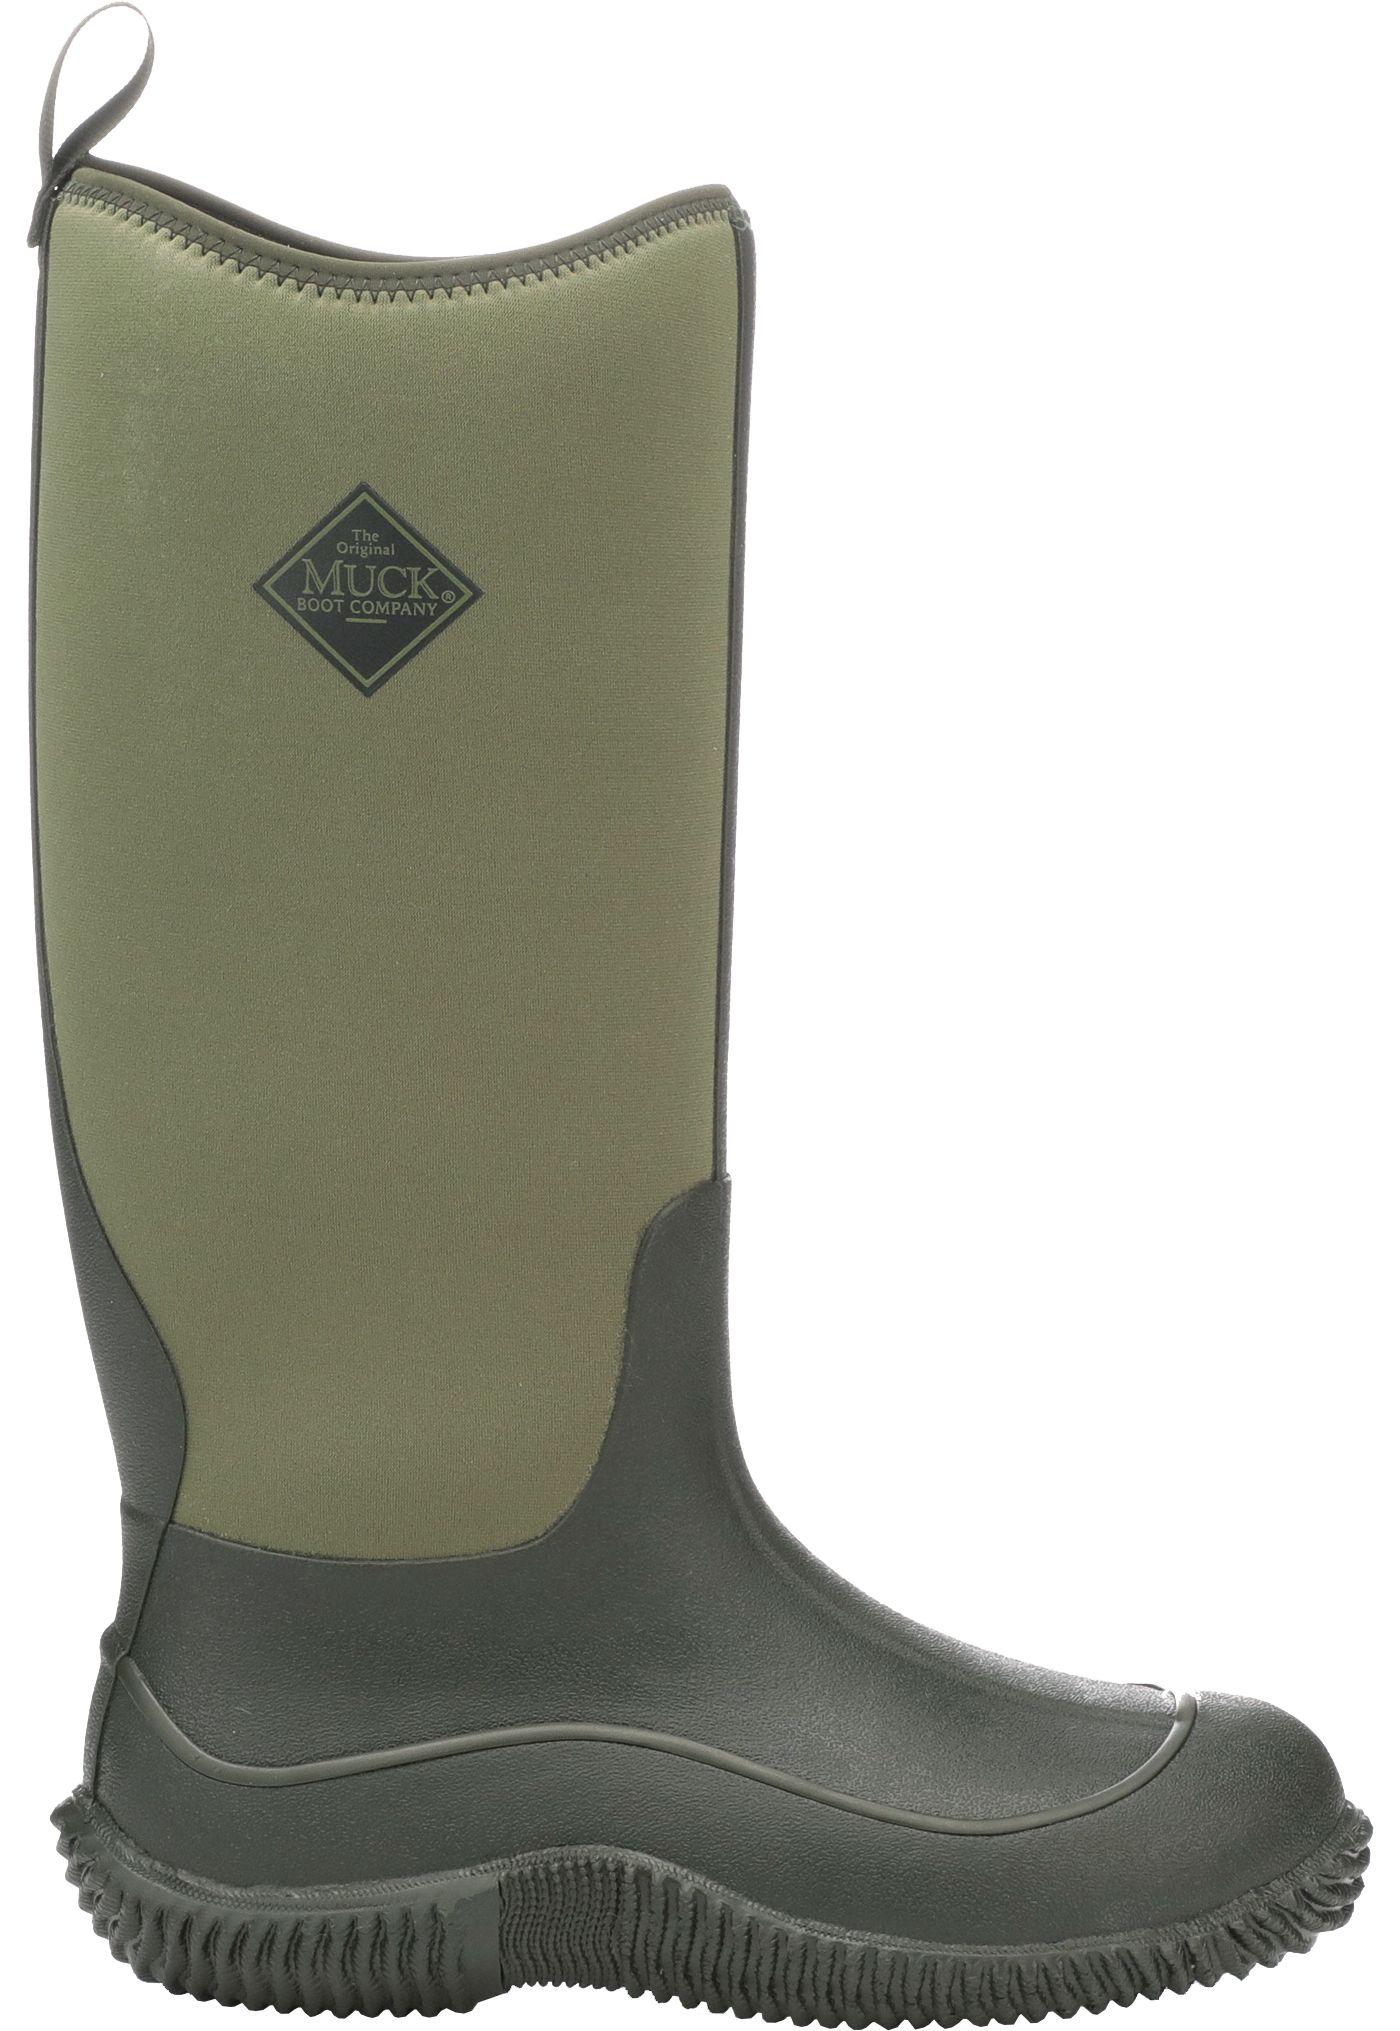 Muck Boots Women's Hale Rain Boots